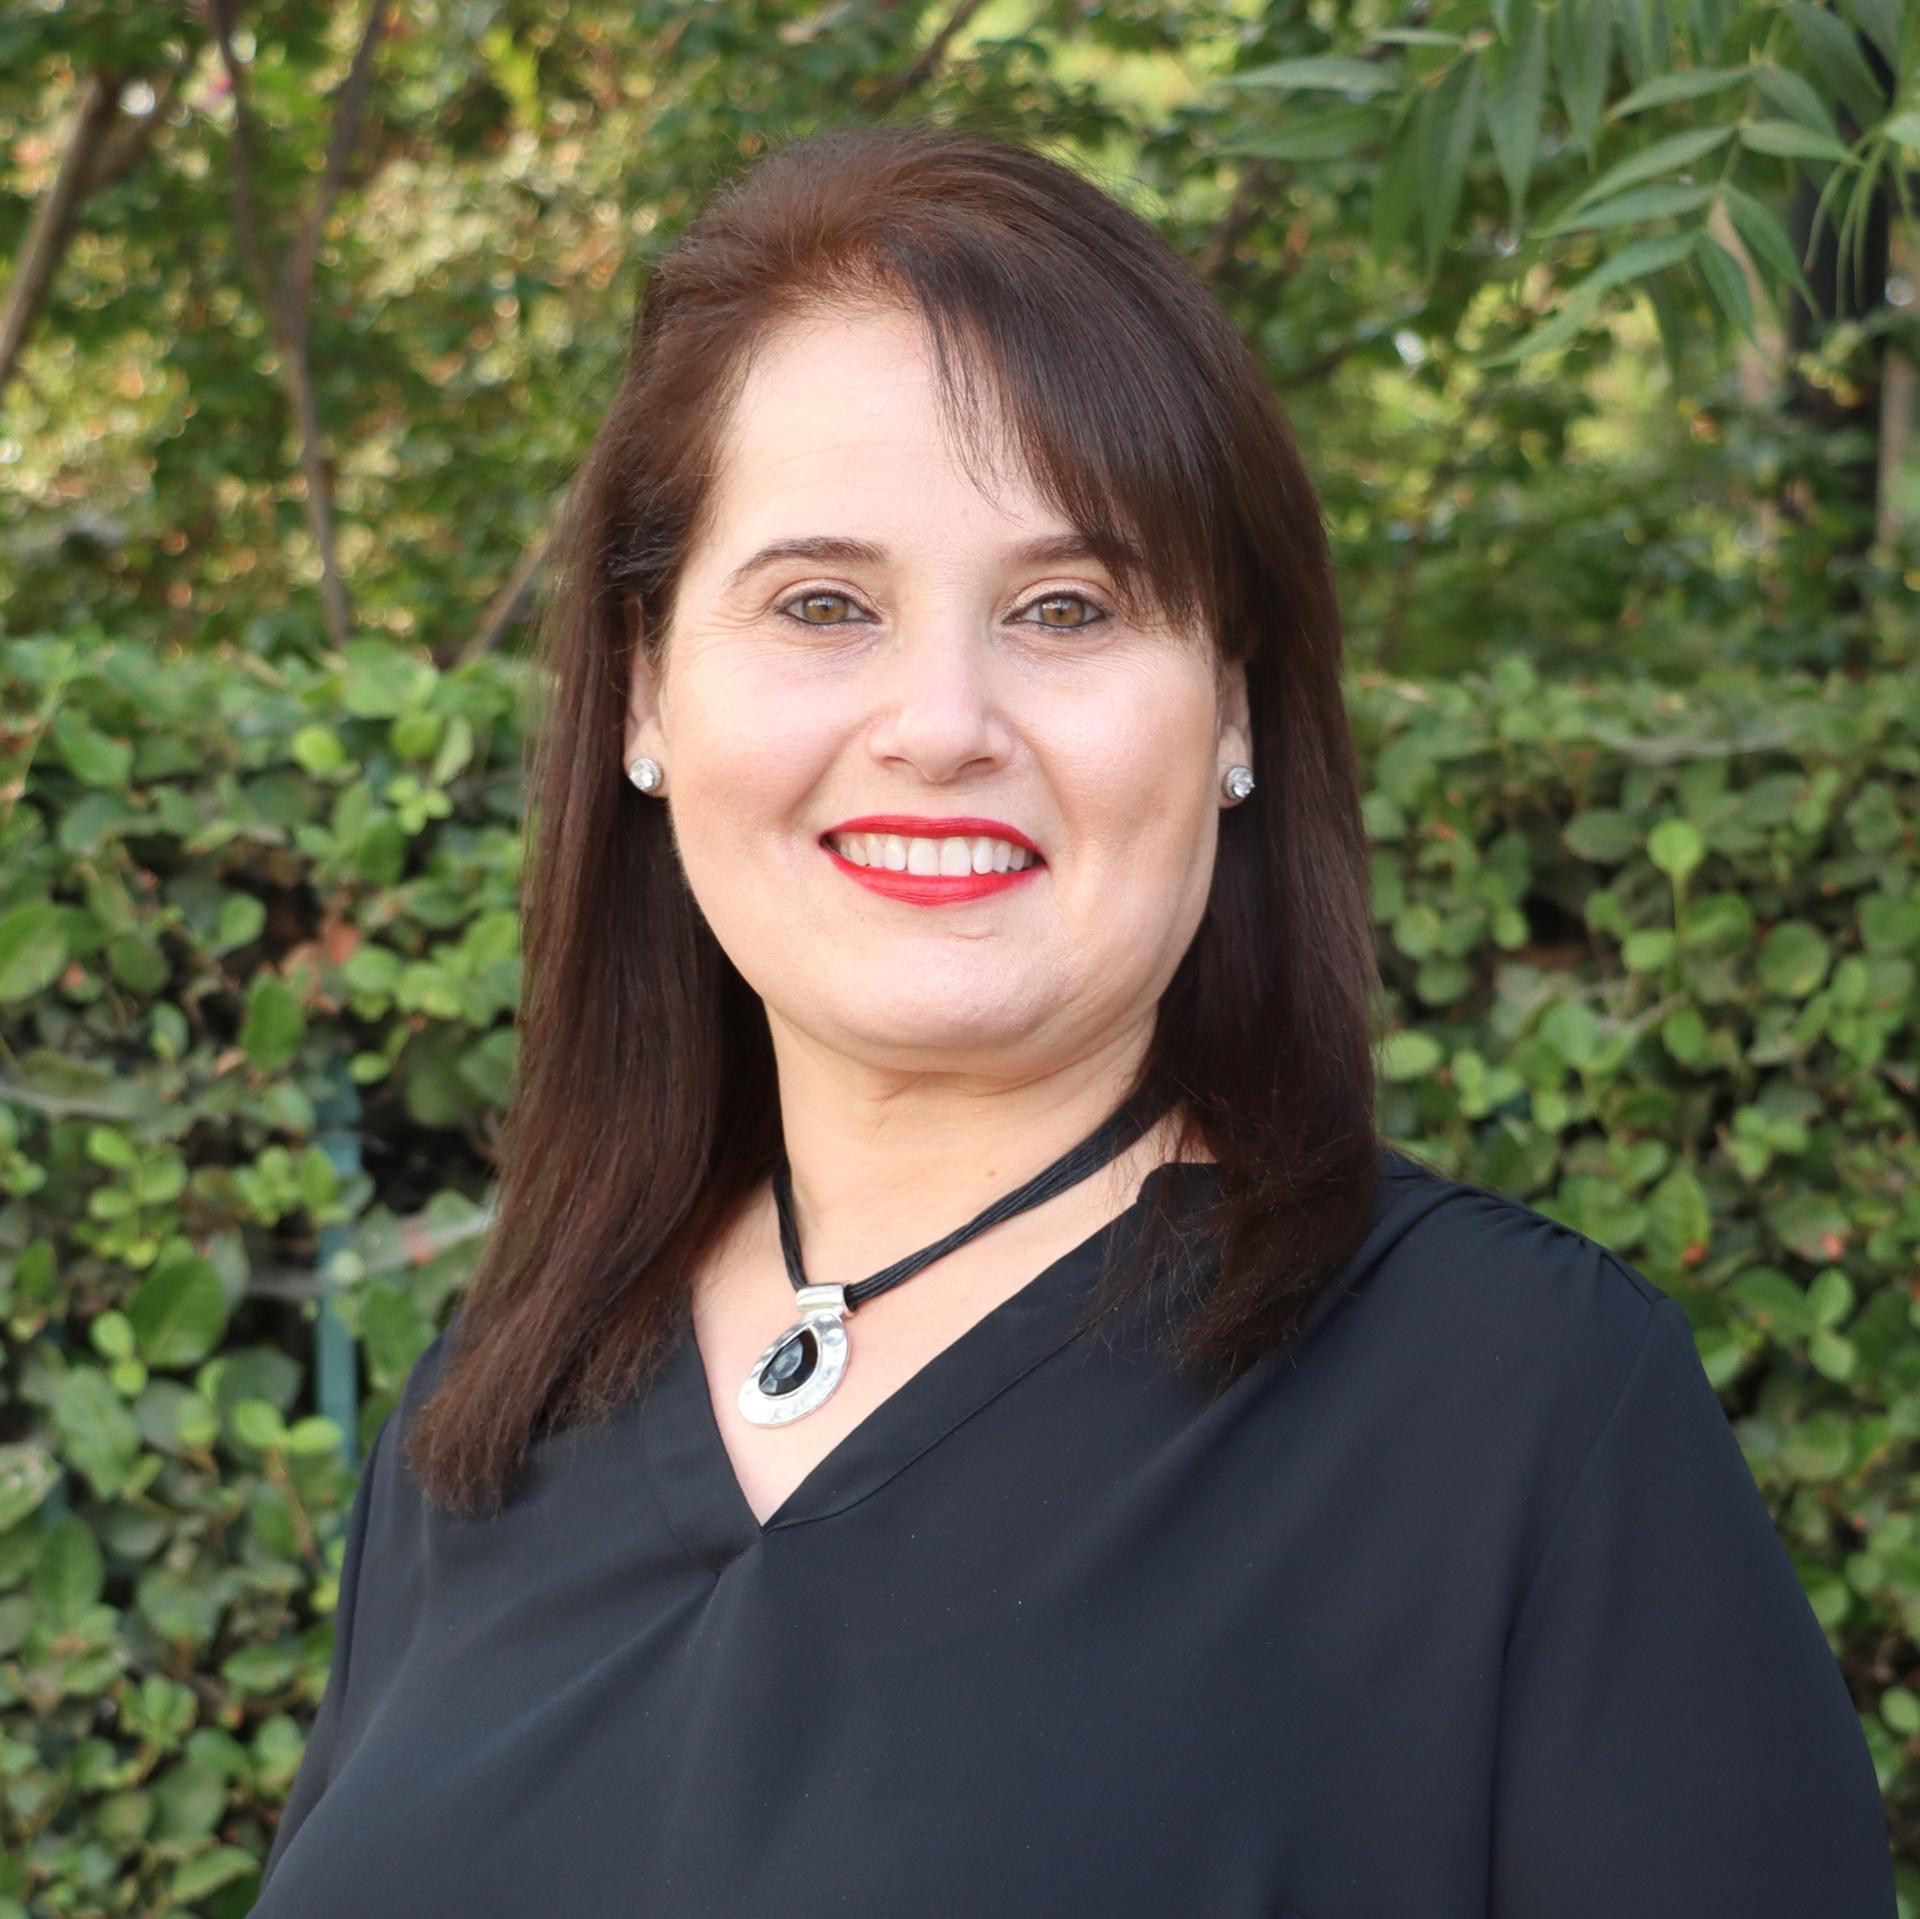 Yolanda Waner - Instructional Specialist